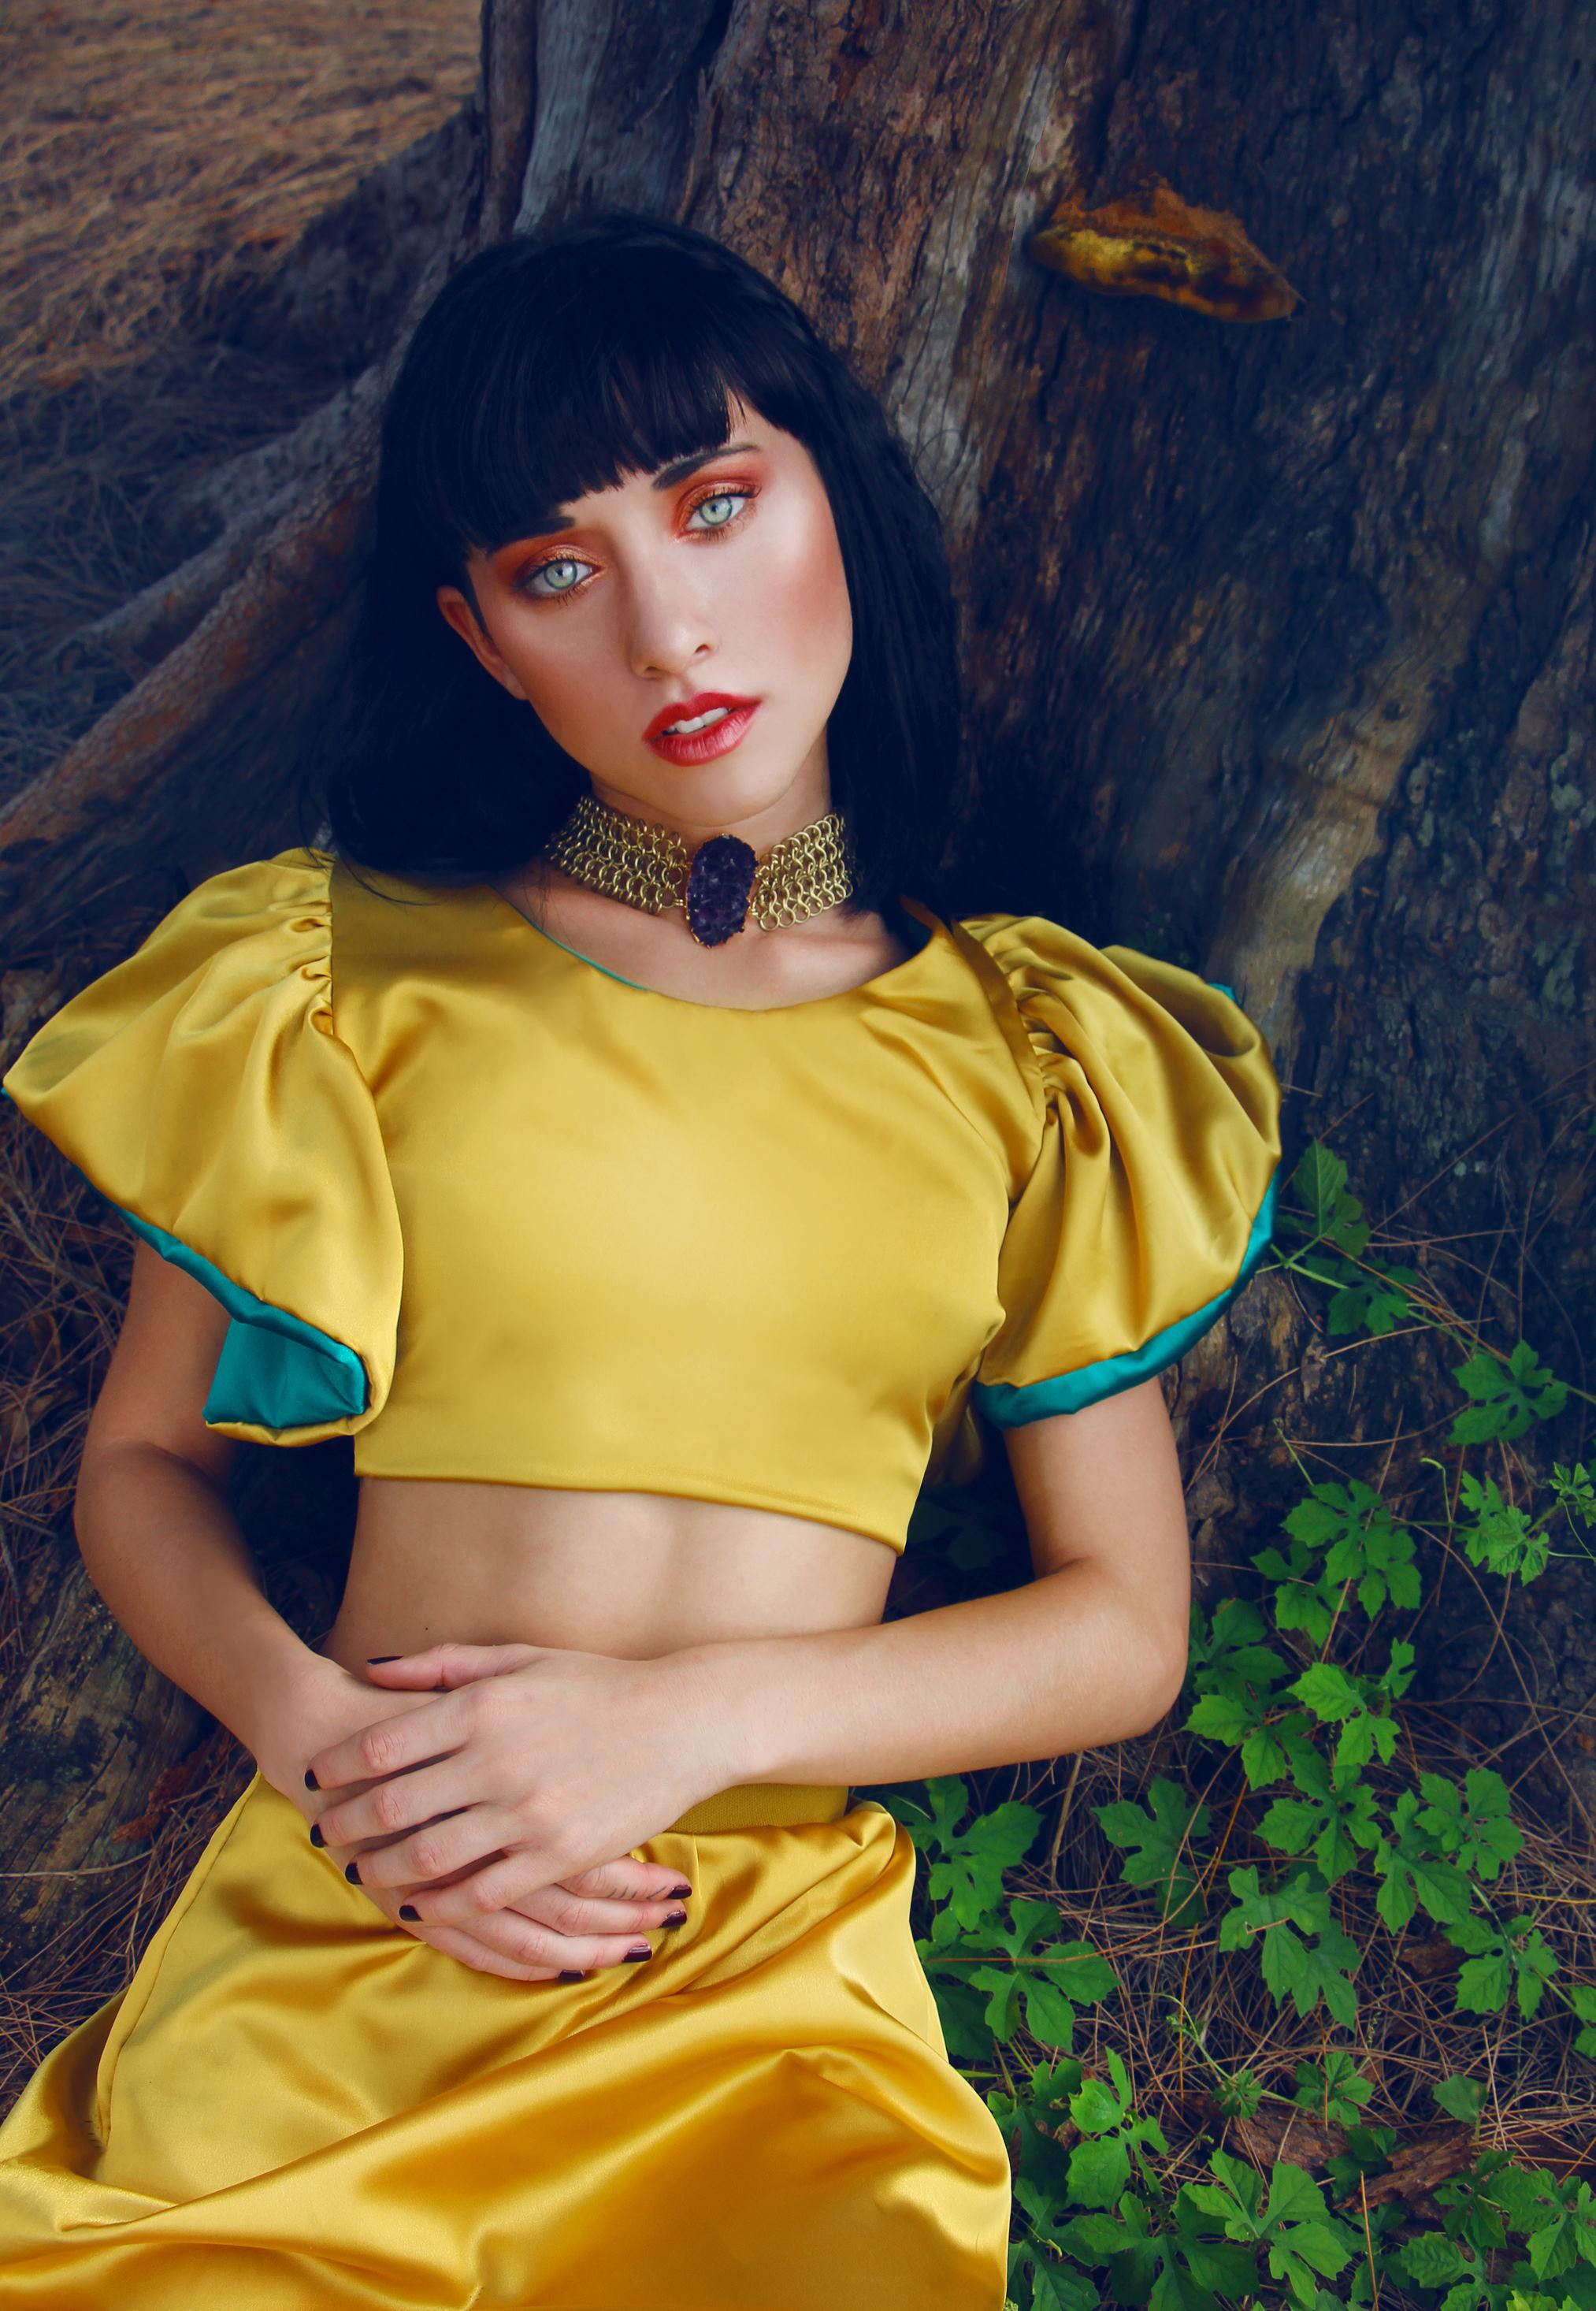 – 9 c Sunamys Villalba Katherine Eastman portrait photography Miami south florida beauty fairytale fashion austrailian blog make up artist